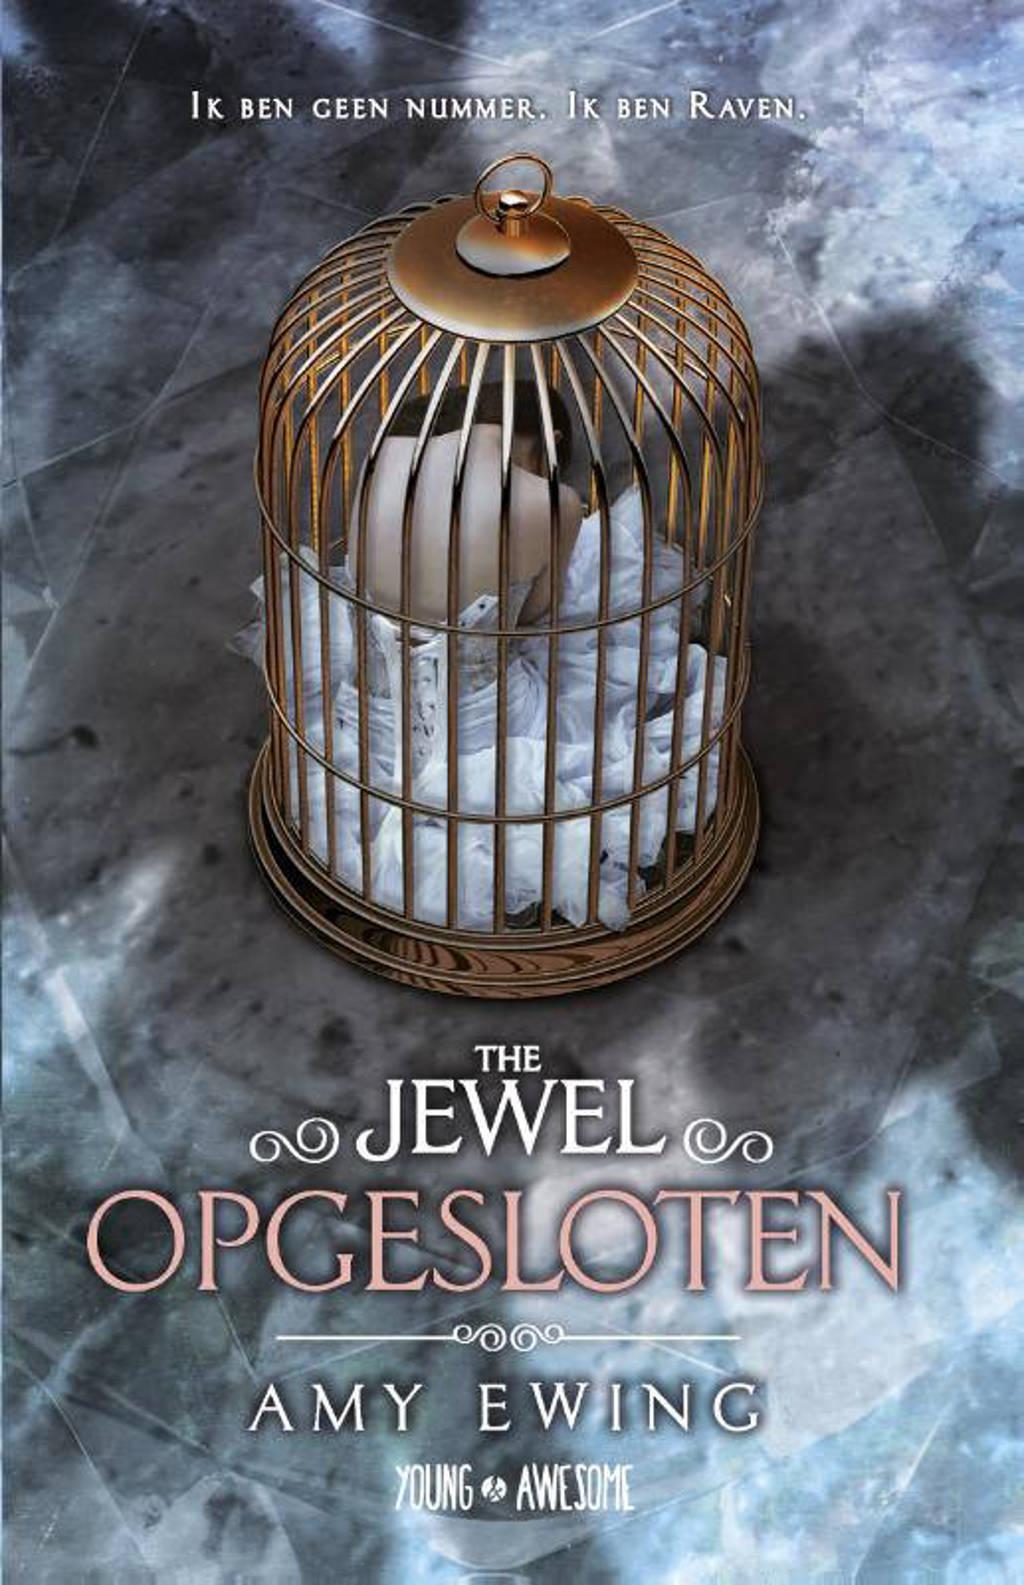 The jewel: Opgesloten - Amy Ewing